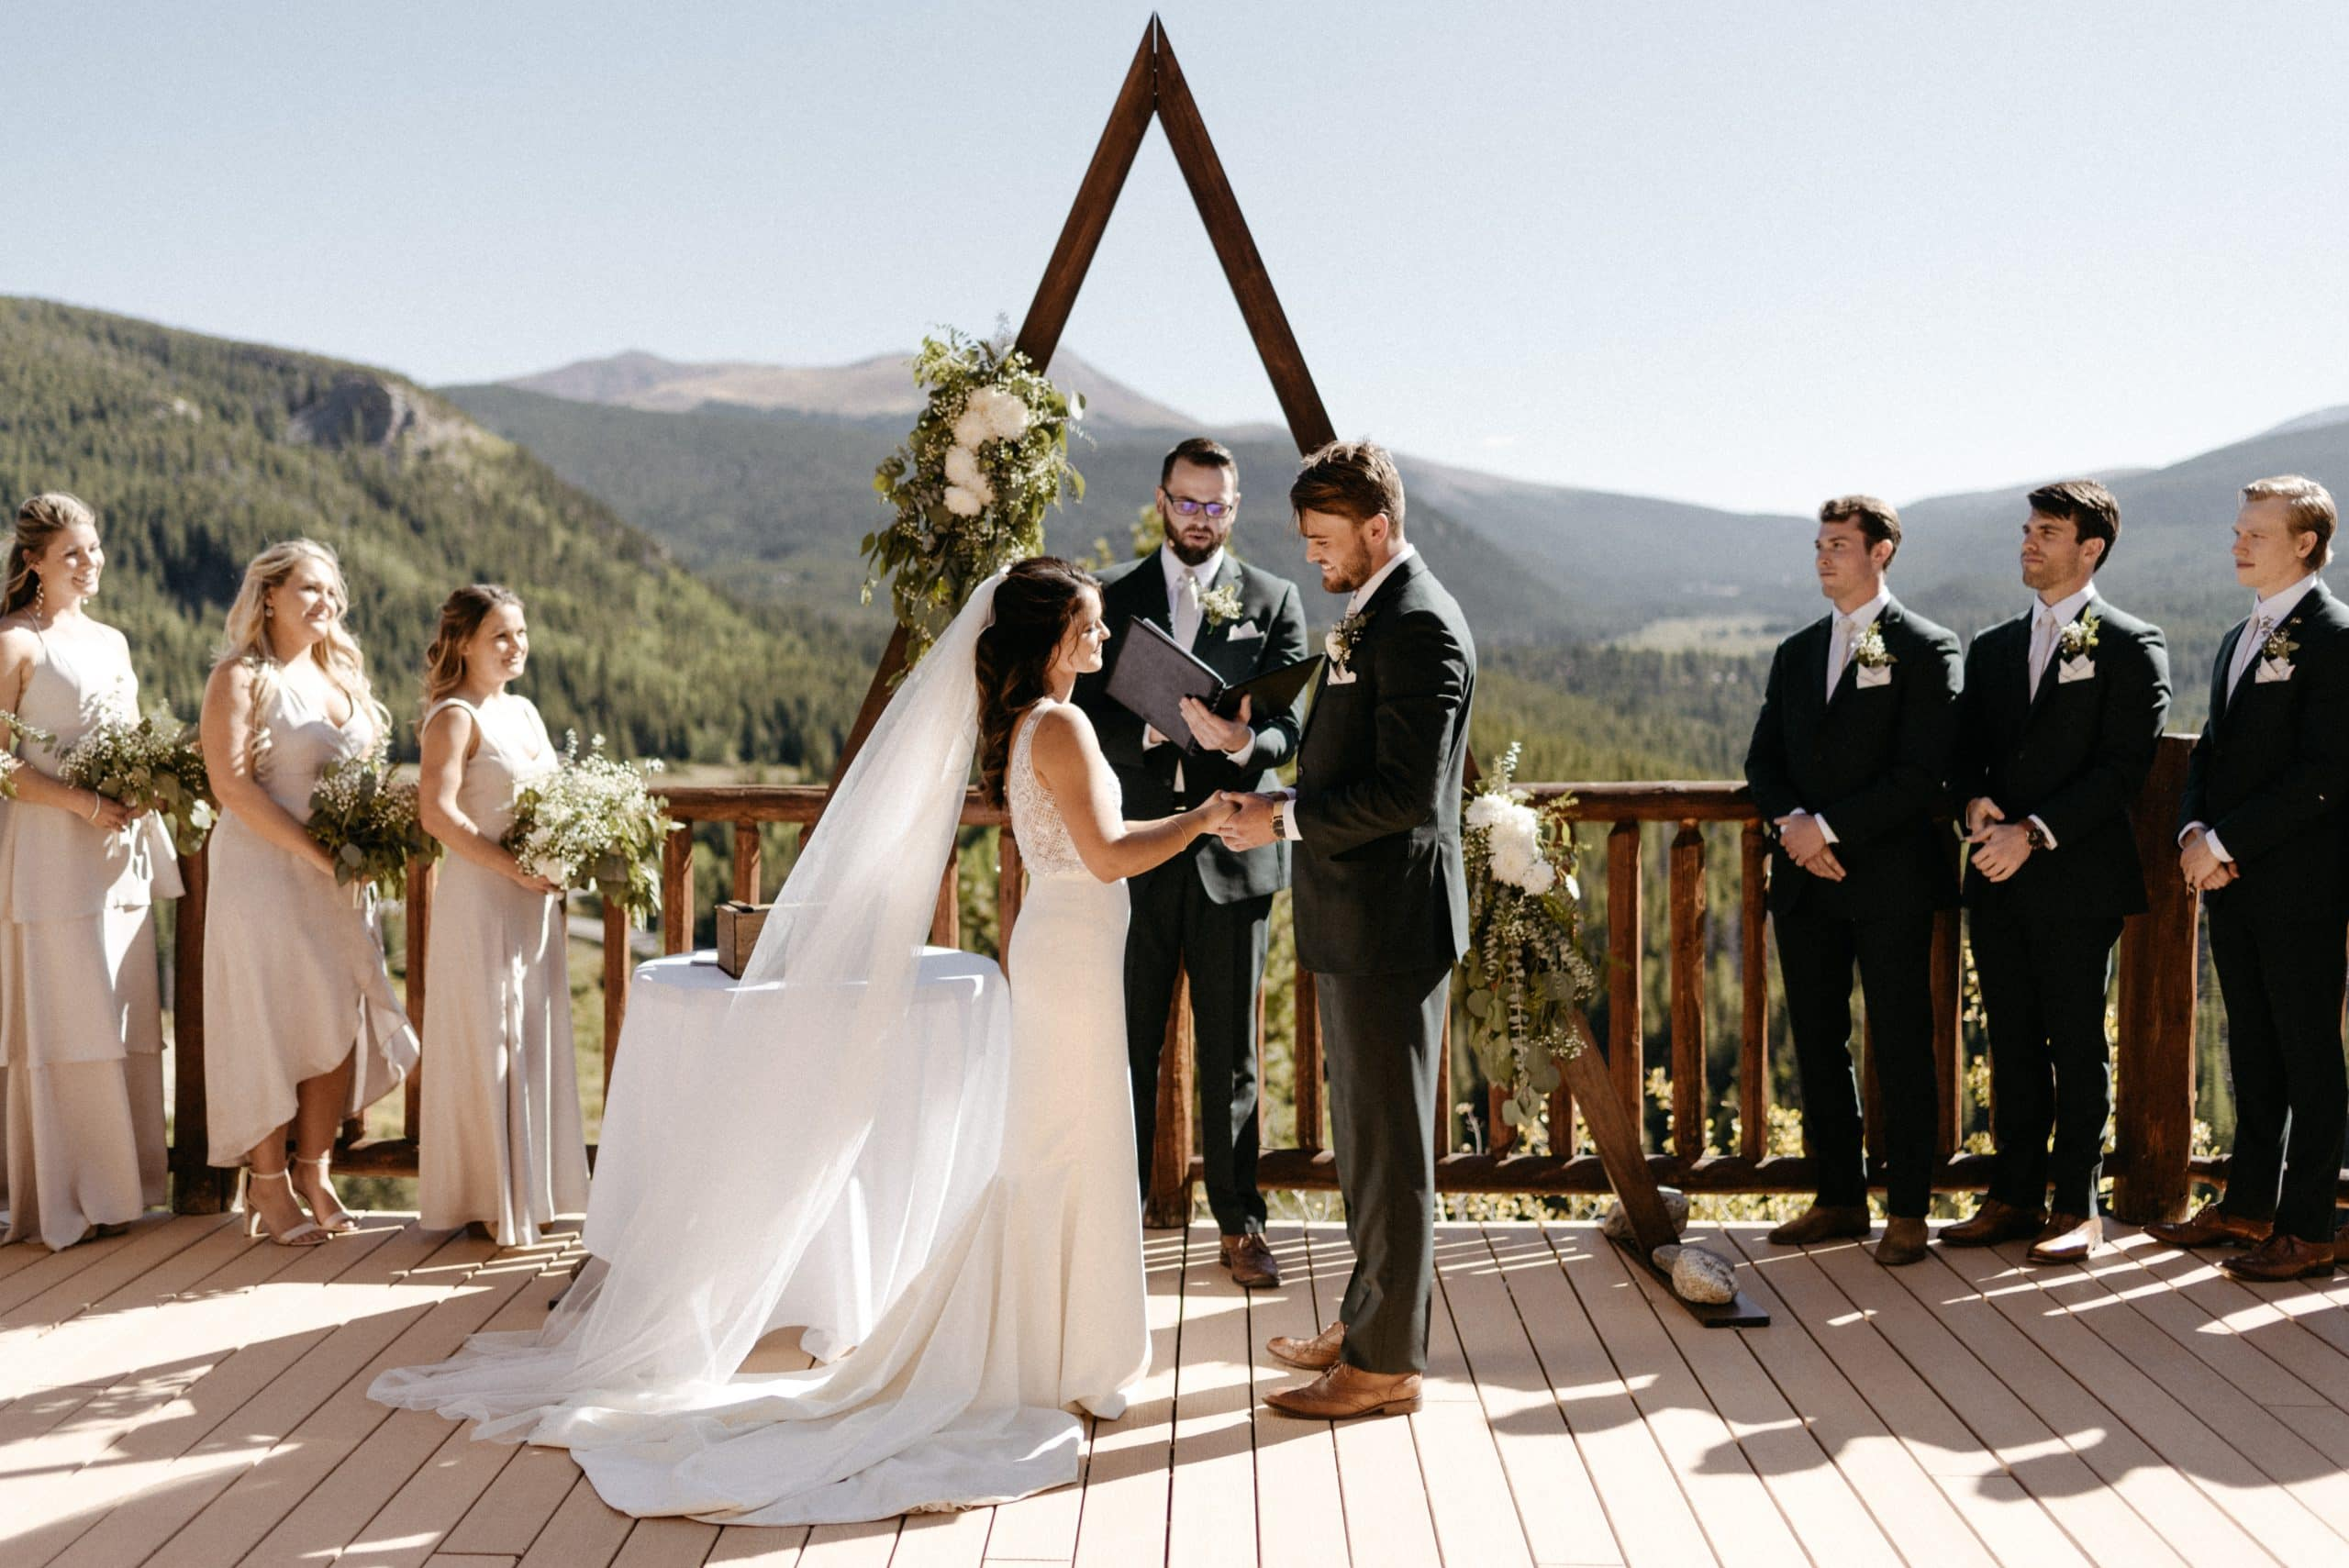 Lodge at Breckenridge Best Colorado Wedding Venue in Breckenridge, CO